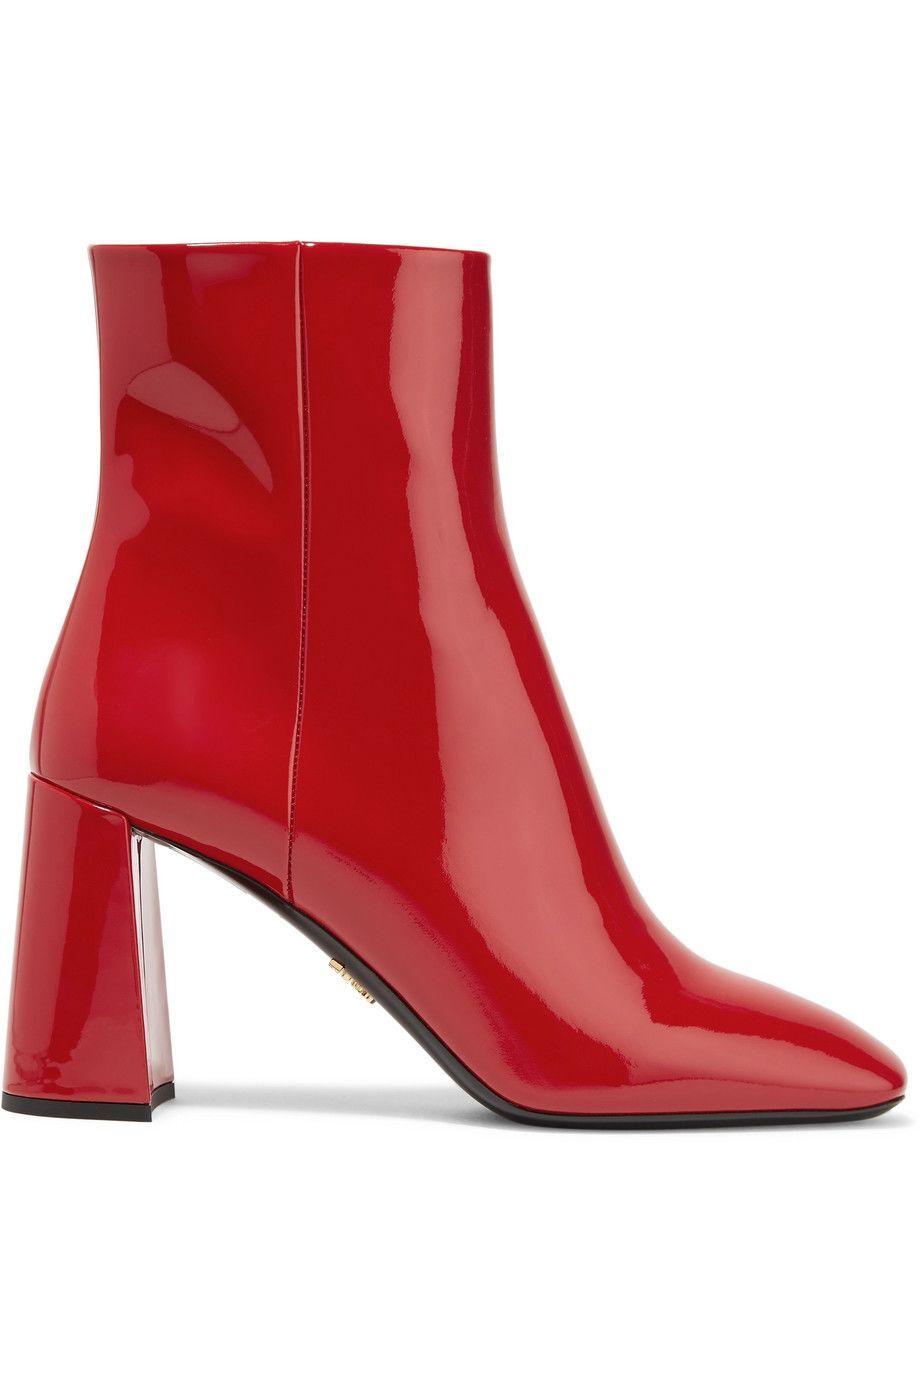 #PopbelaOOTD: Saatnya Update Ankle Boots Baru!